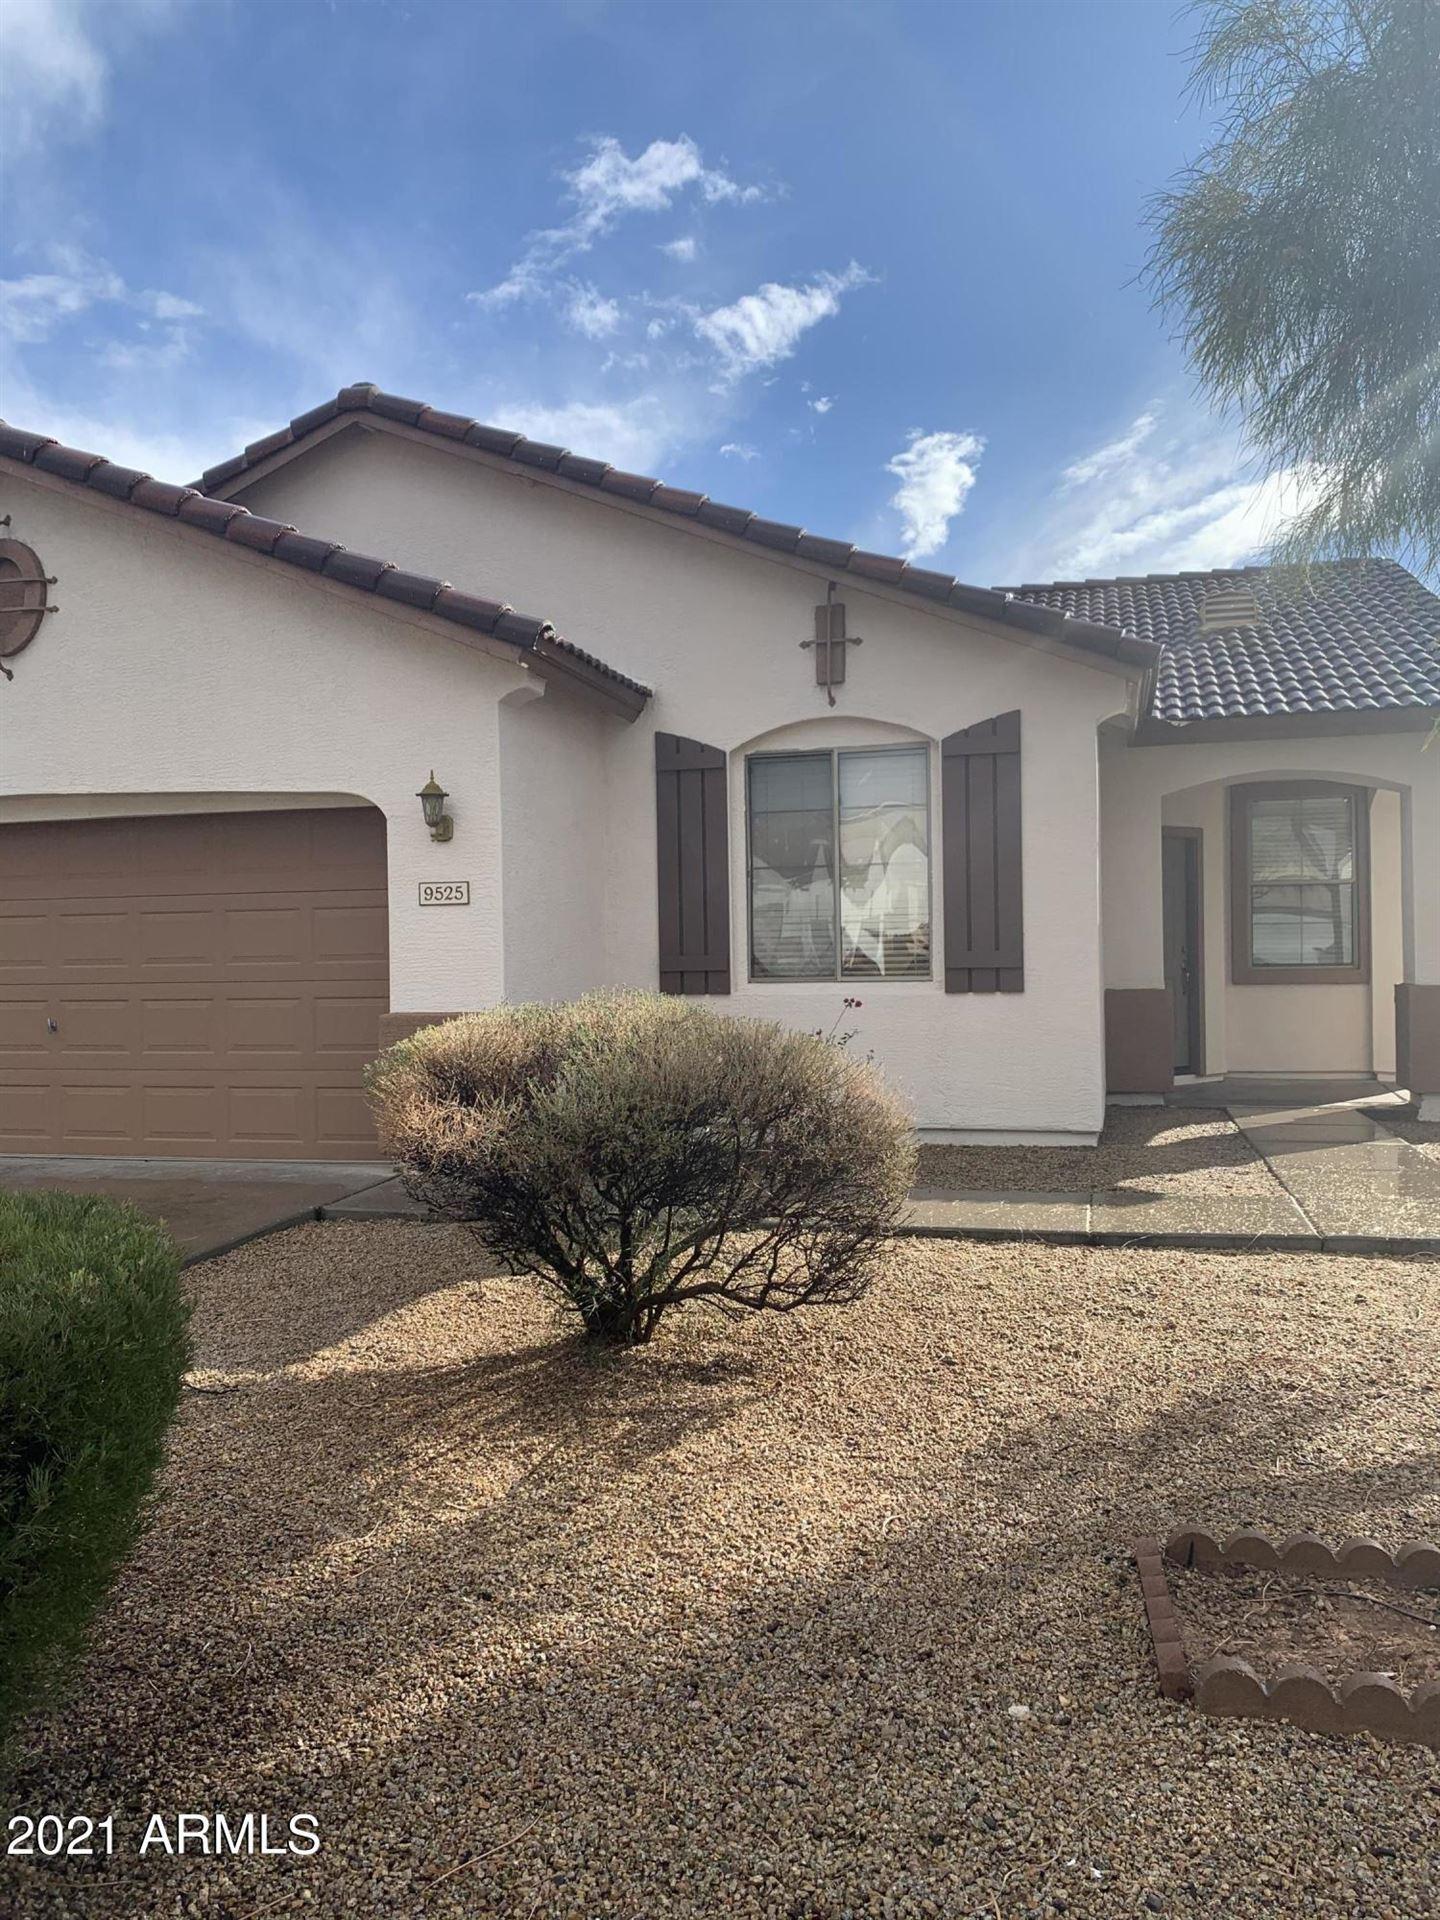 9525 W HAZELWOOD Street, Phoenix, AZ 85037 - MLS#: 6185349